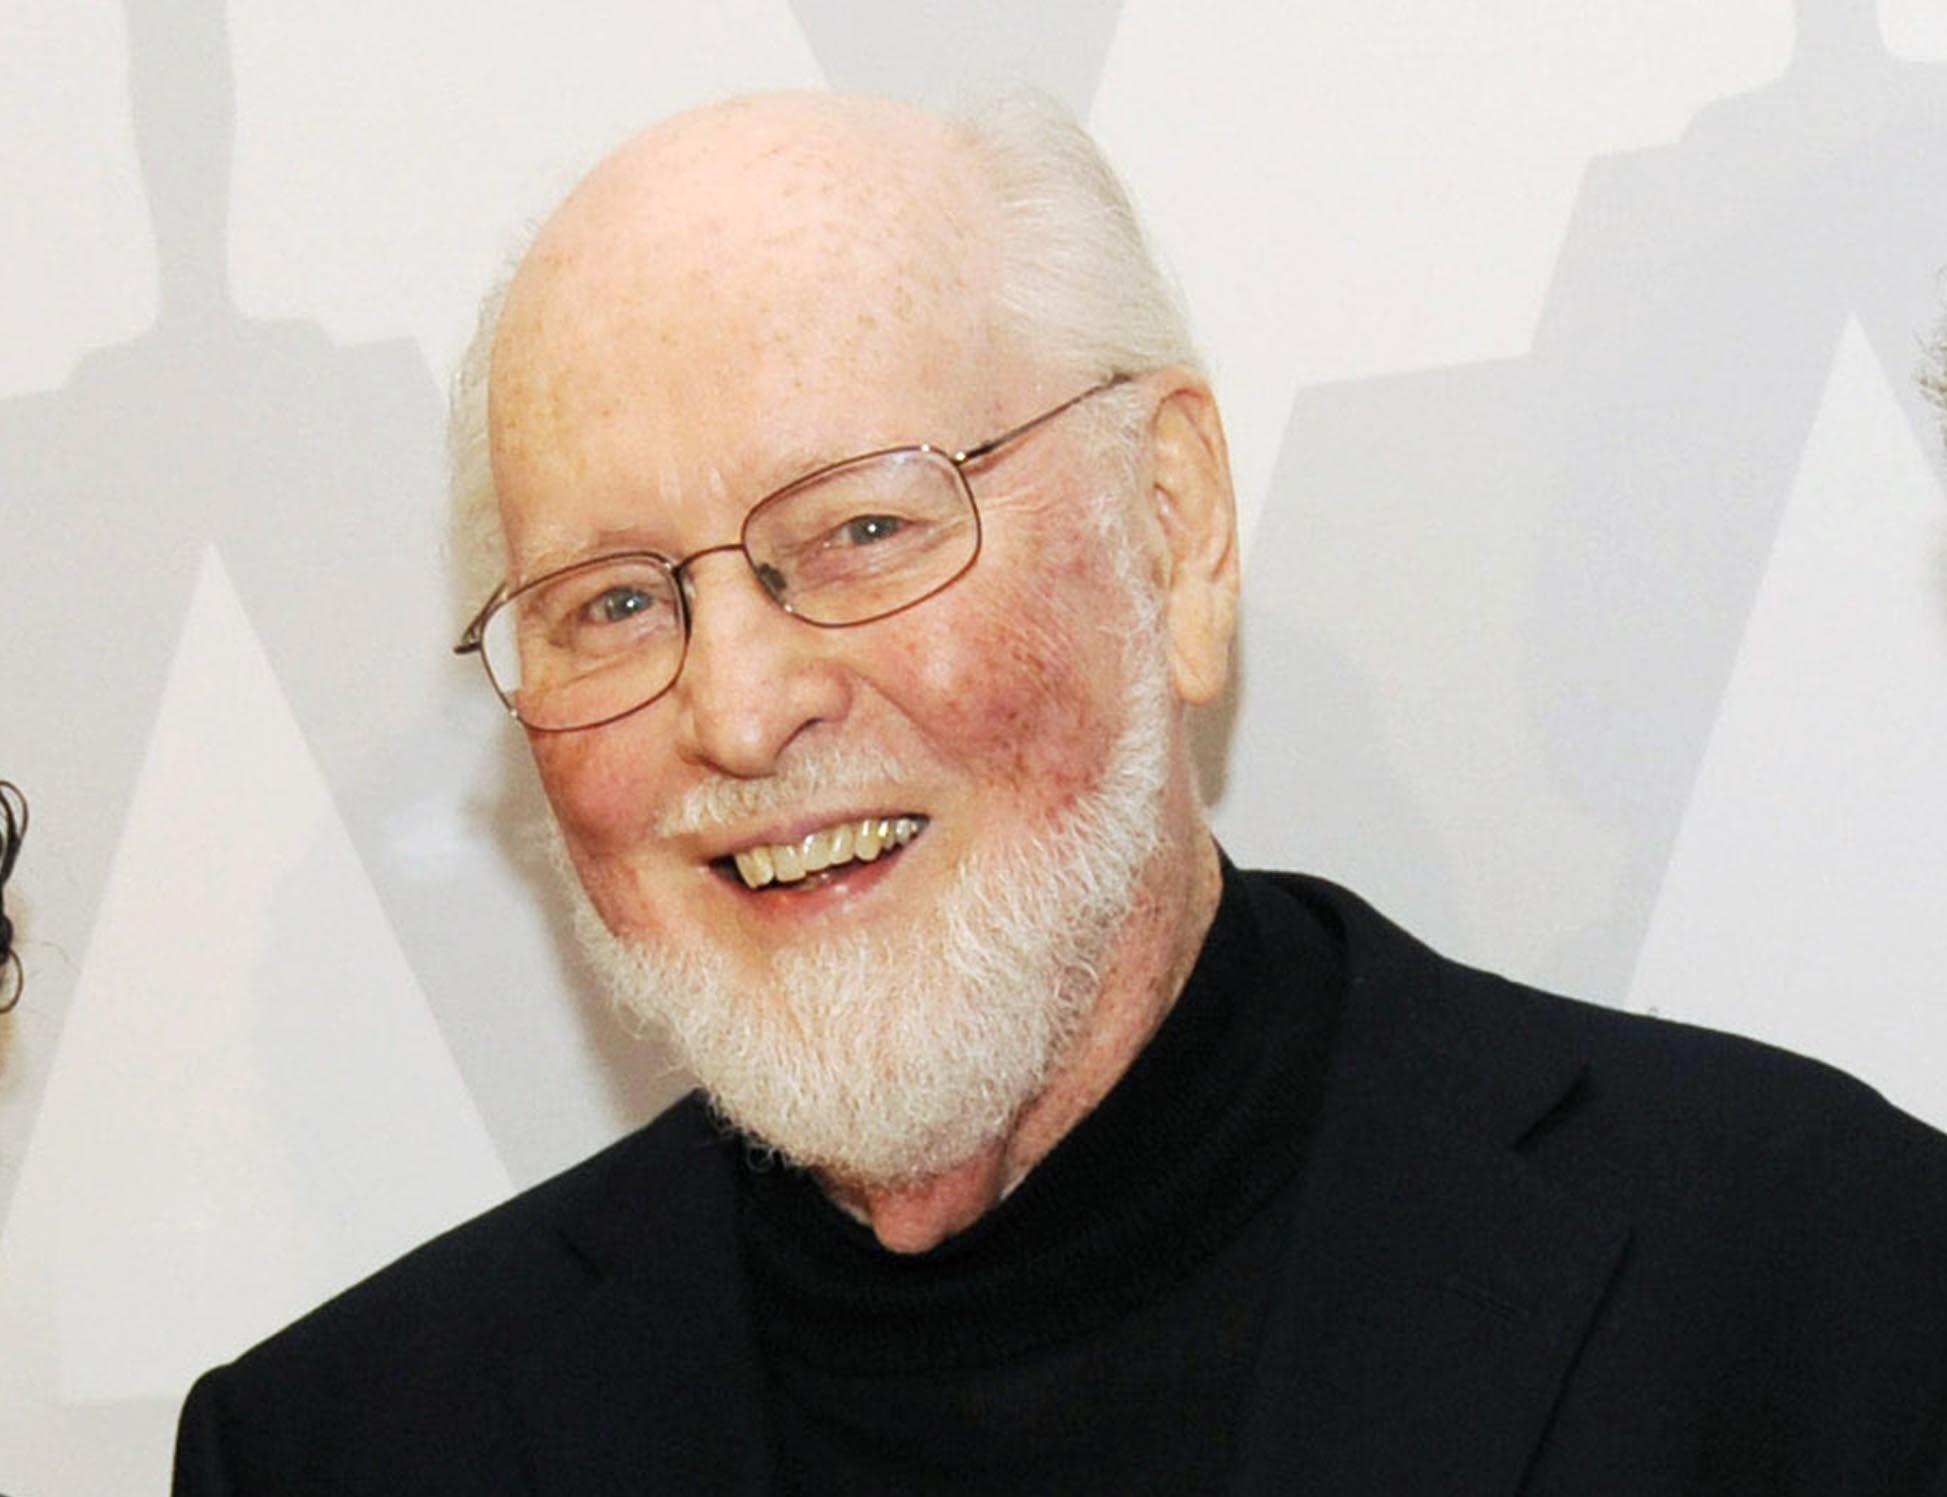 Composer John Williams